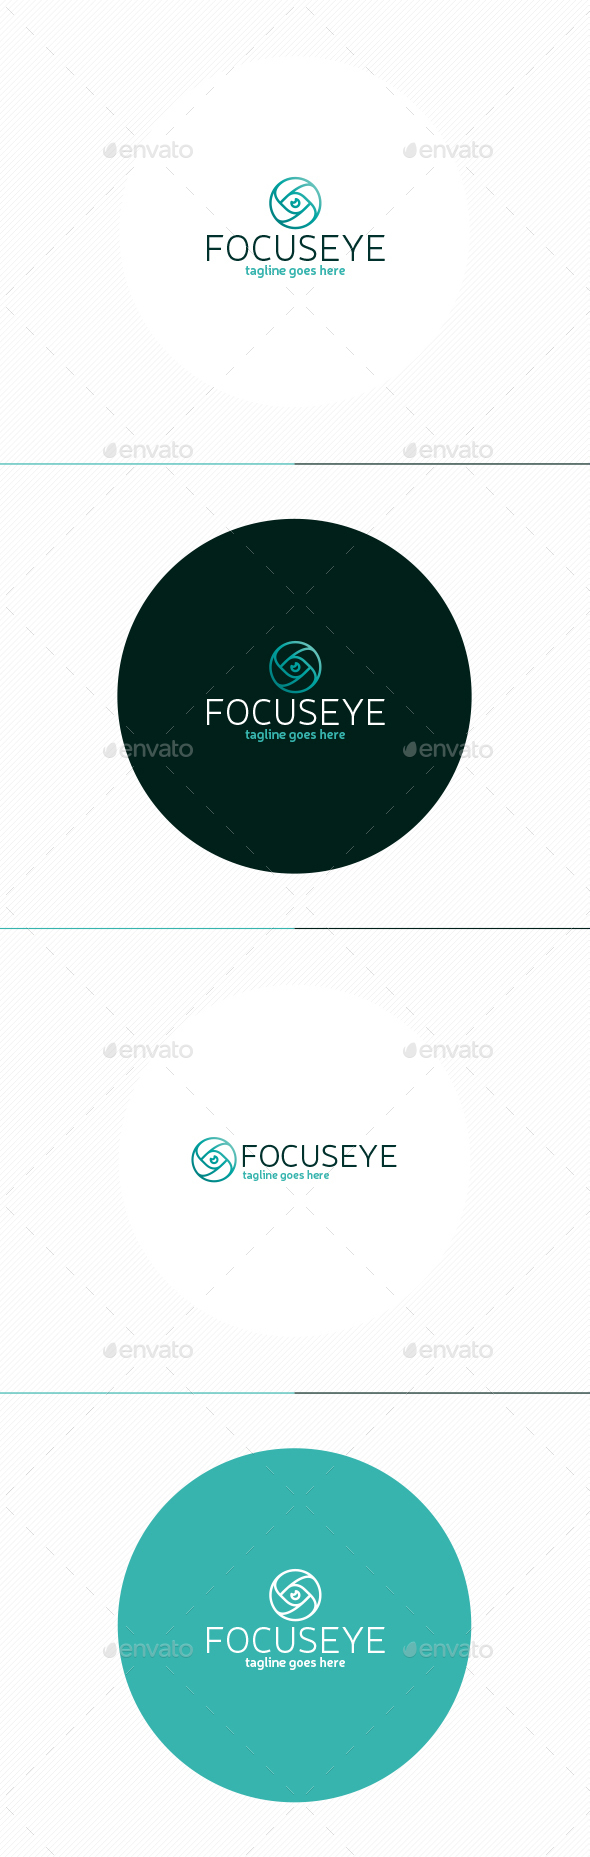 Focus Eye Logo - Objects Logo Templates